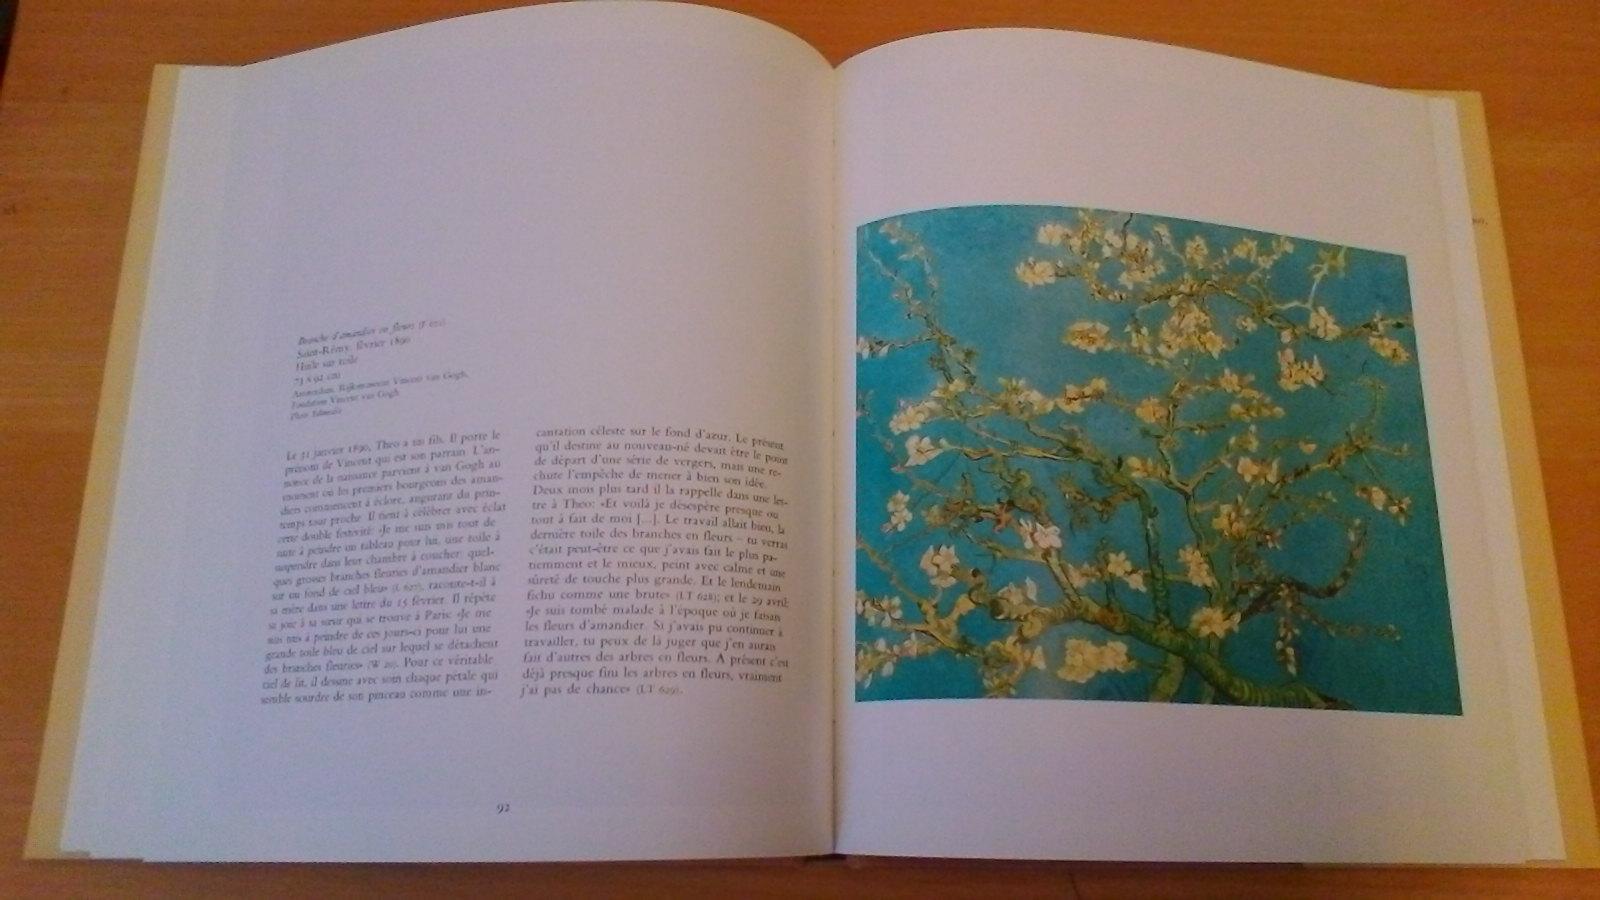 Article De Jardin Luxe Le Jardin De Van Gogh Of 30 Inspirant Article De Jardin